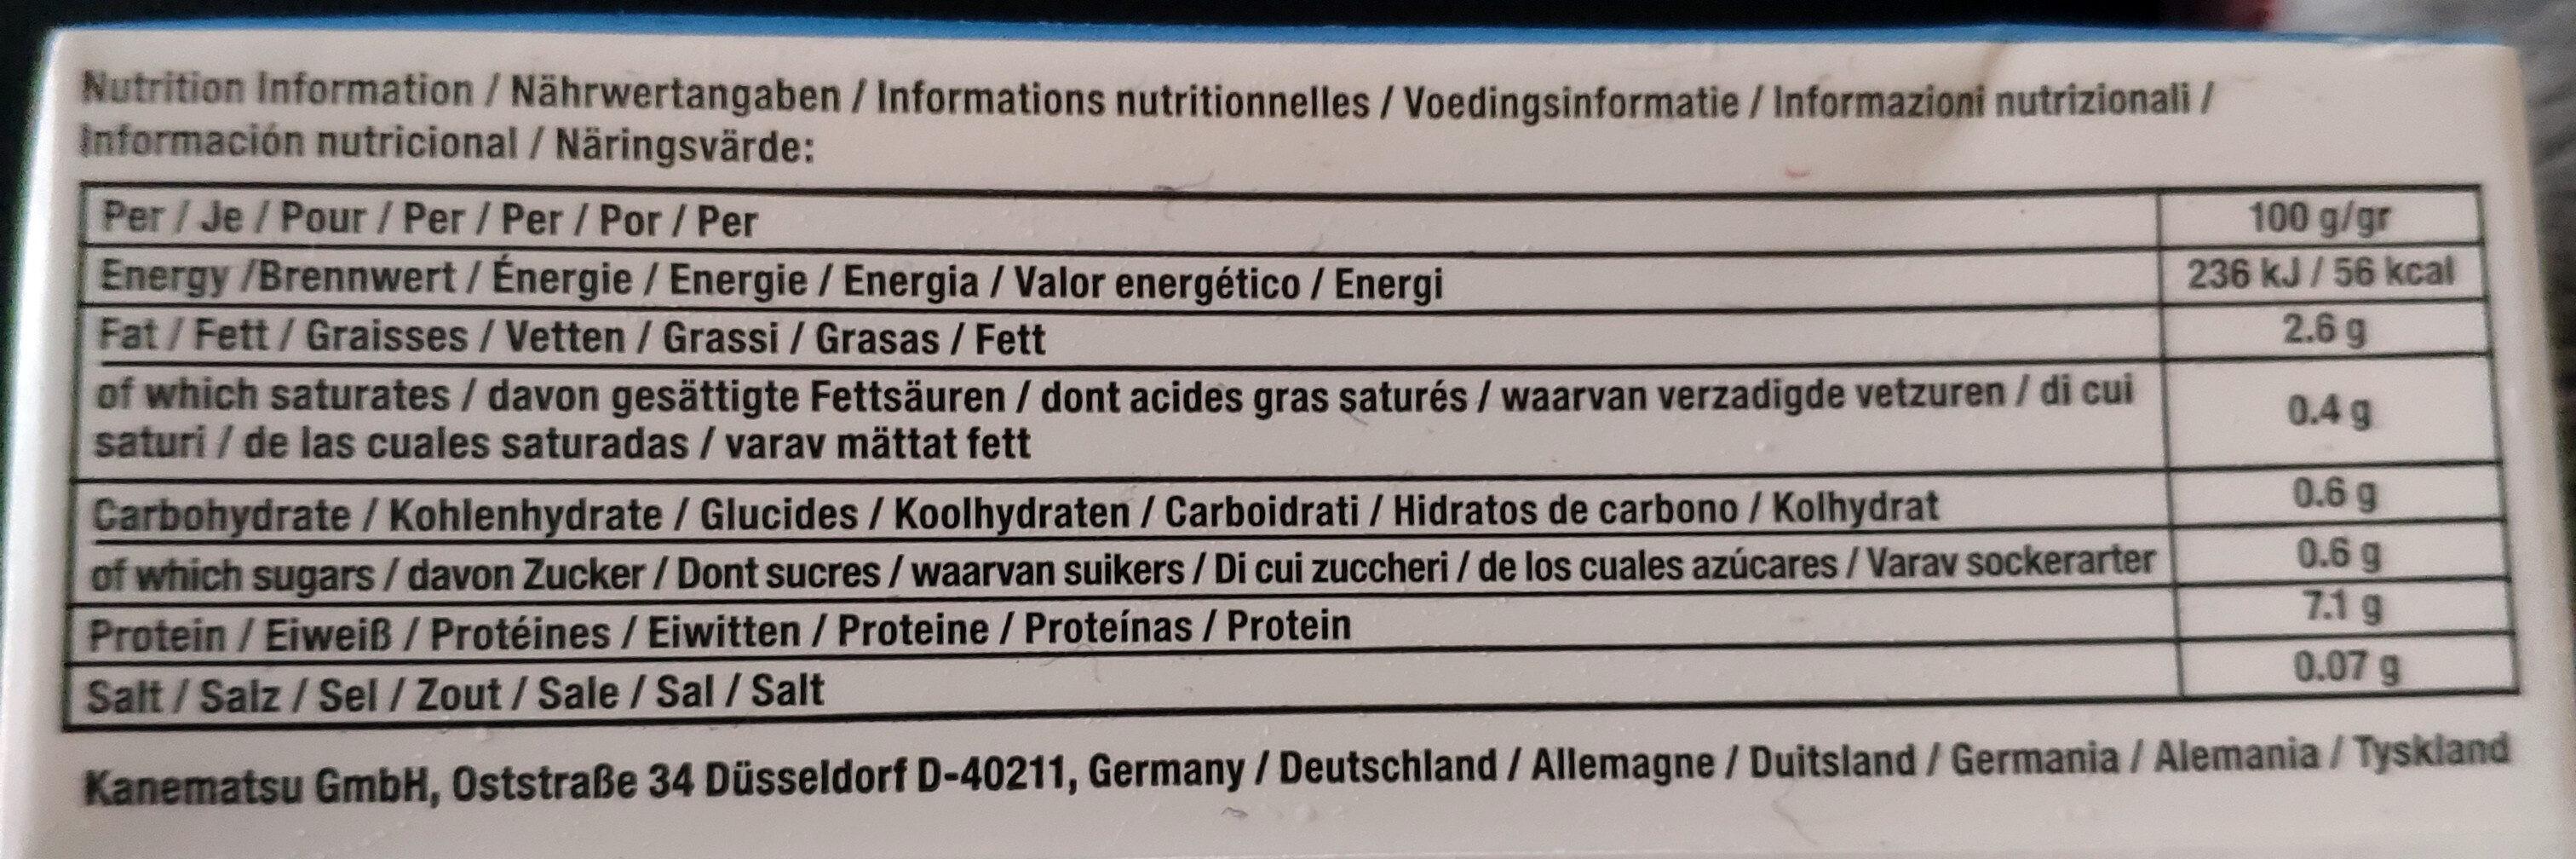 Mori-nu Silken Tofu Firm - Nutrition facts - en